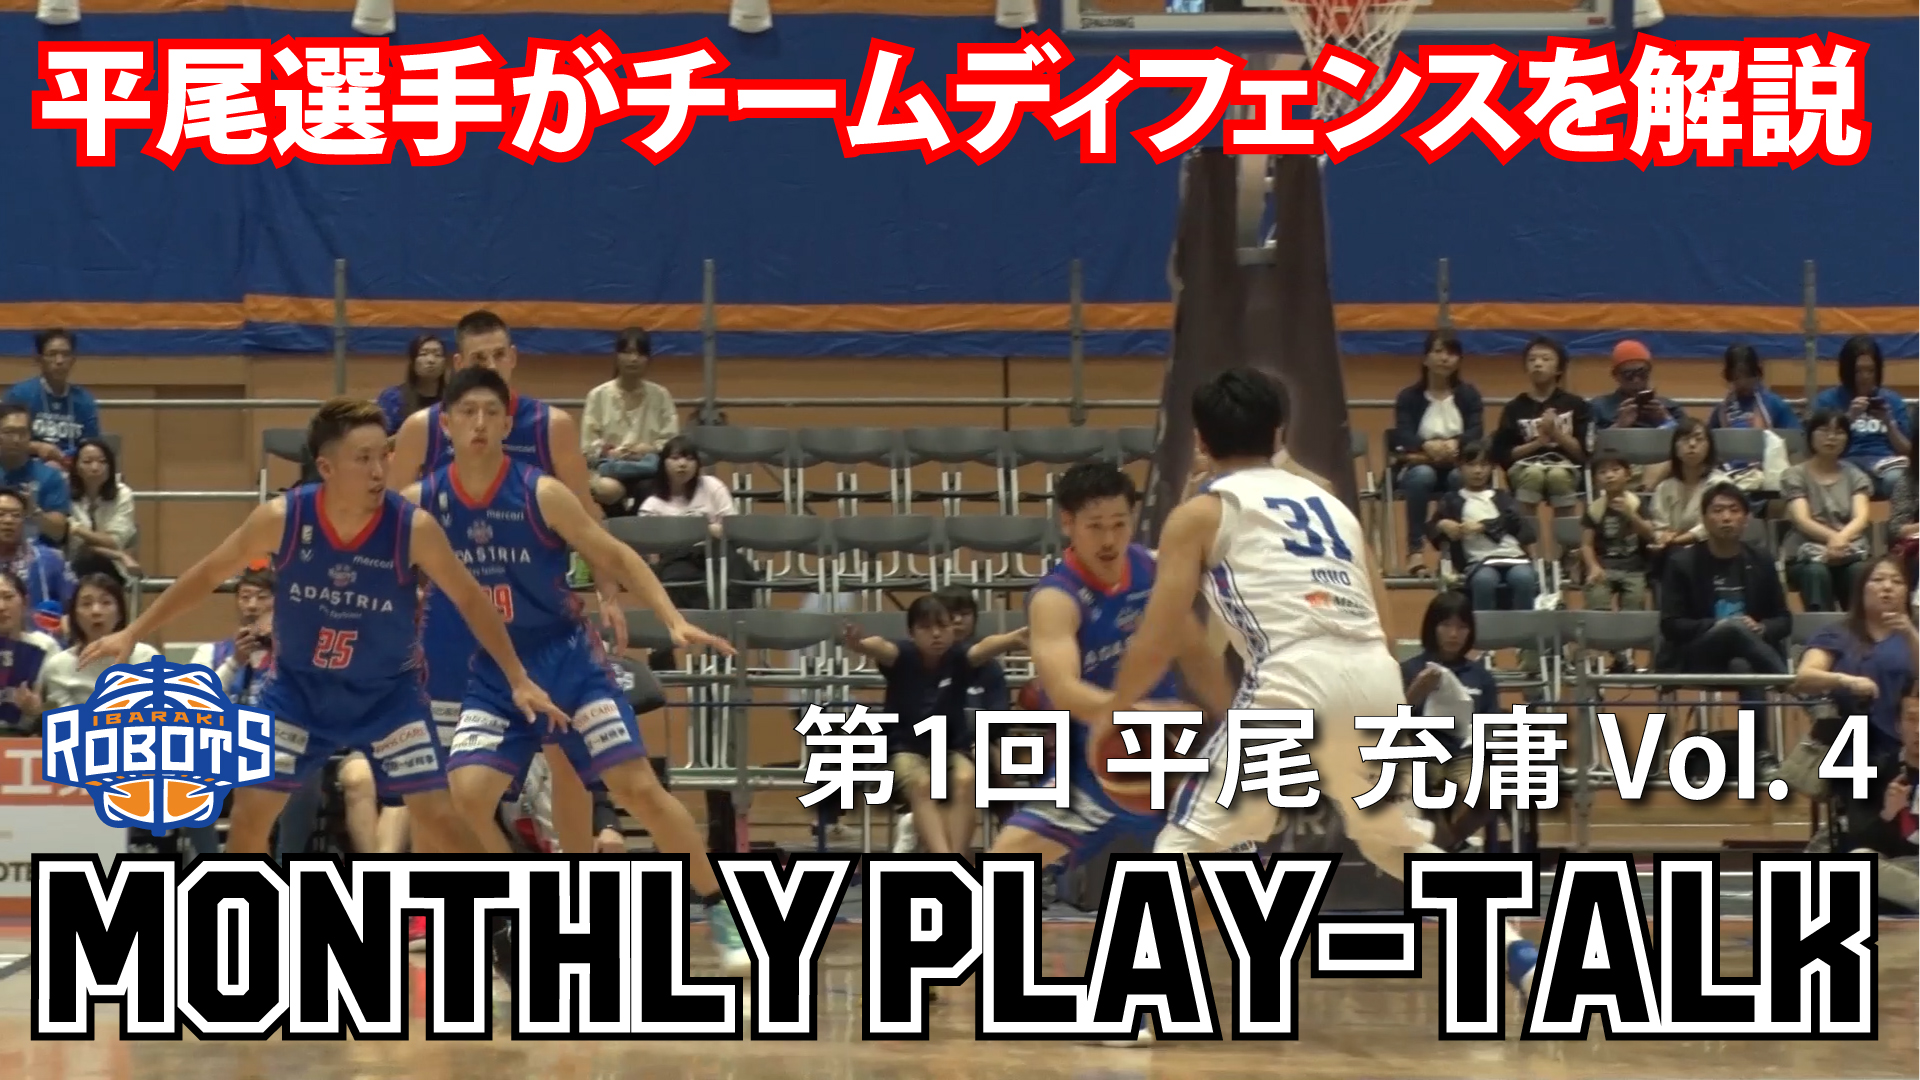 【ROBOTS TV】『MONTHLY PLAY-TALK | 平尾 充庸選手 第1回 Vol.4』